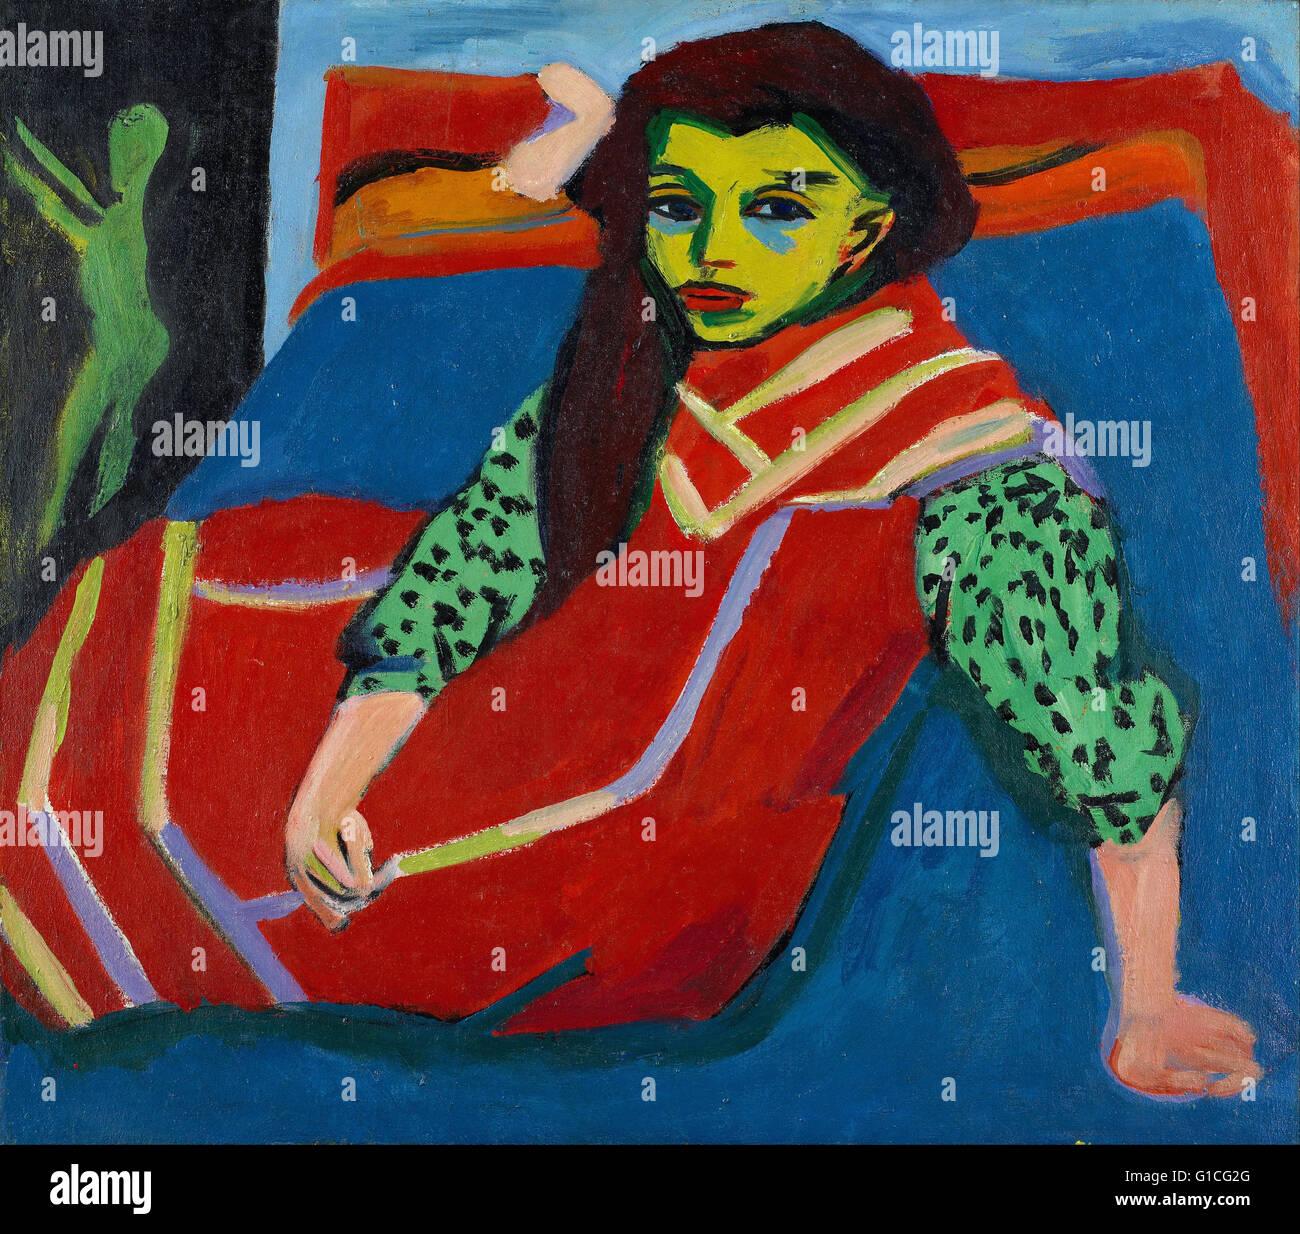 Ernst Ludwig Kirchner - Seated Girl (Fränzi Fehrmann) - Minneapolis Institute of Art - Stock Image